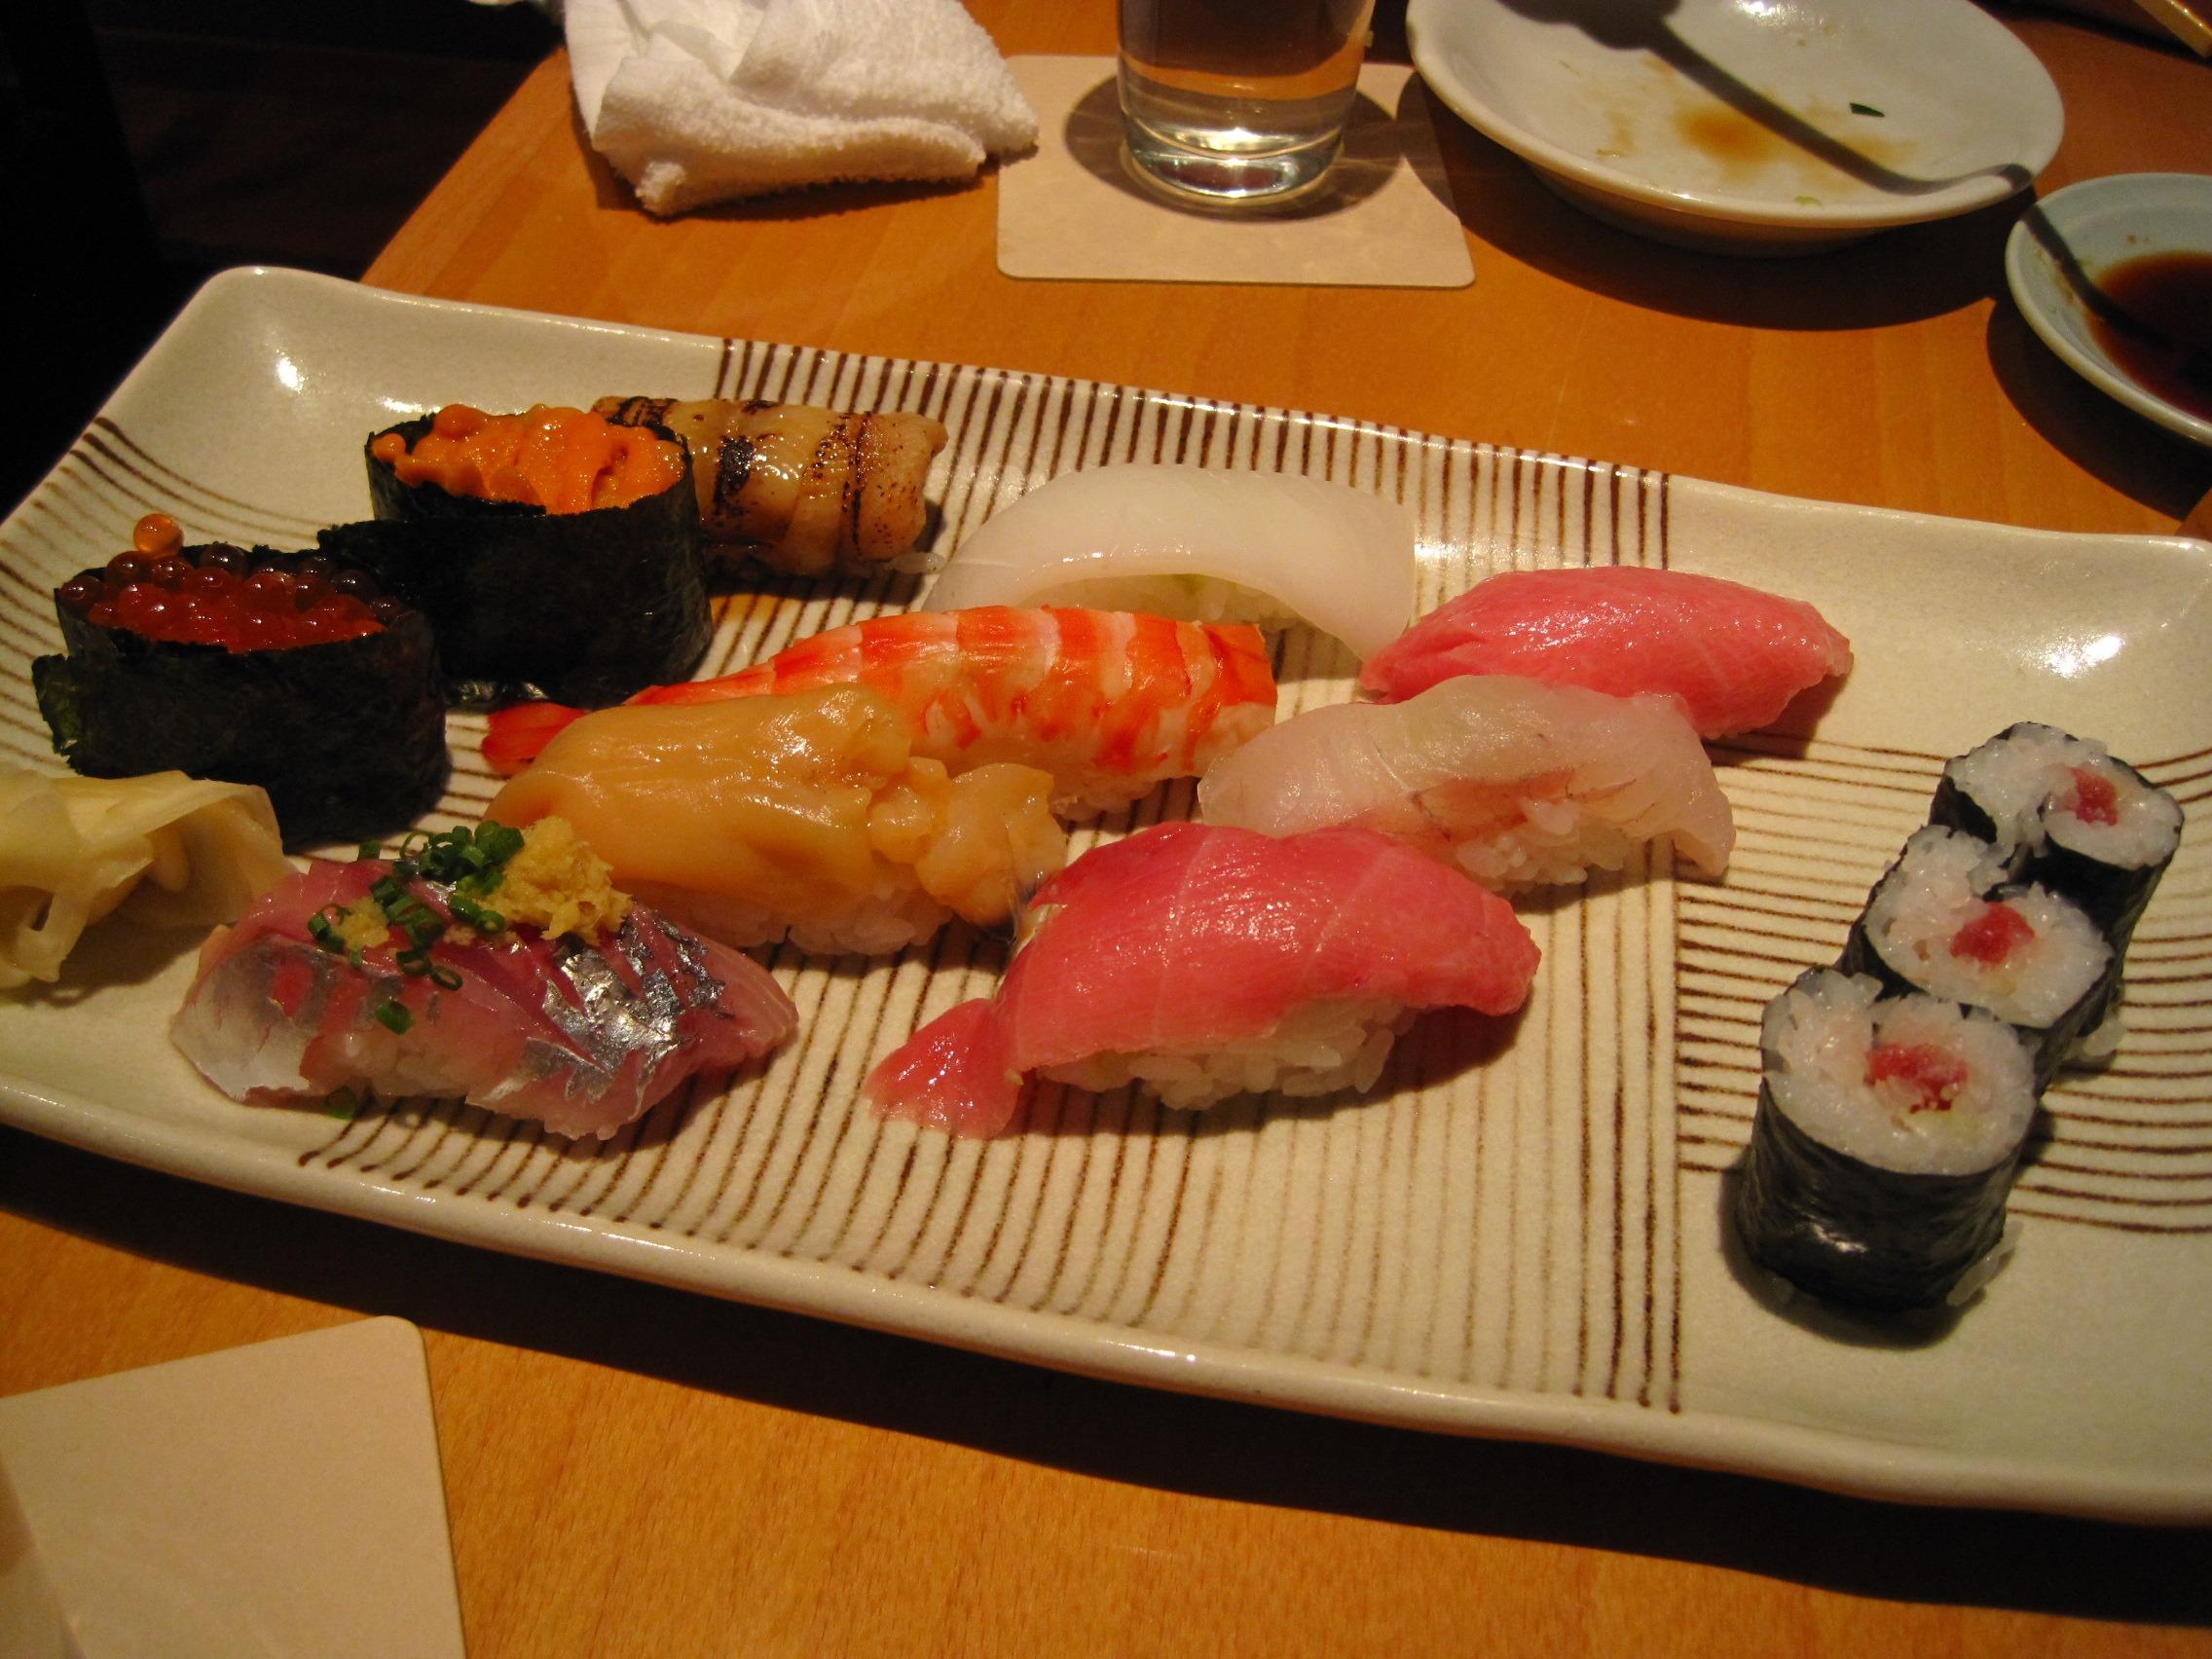 restaurante plato comida comida pescado japn almuerzo cocina arroz comida asitica sushi sashimi japons rodar crudo